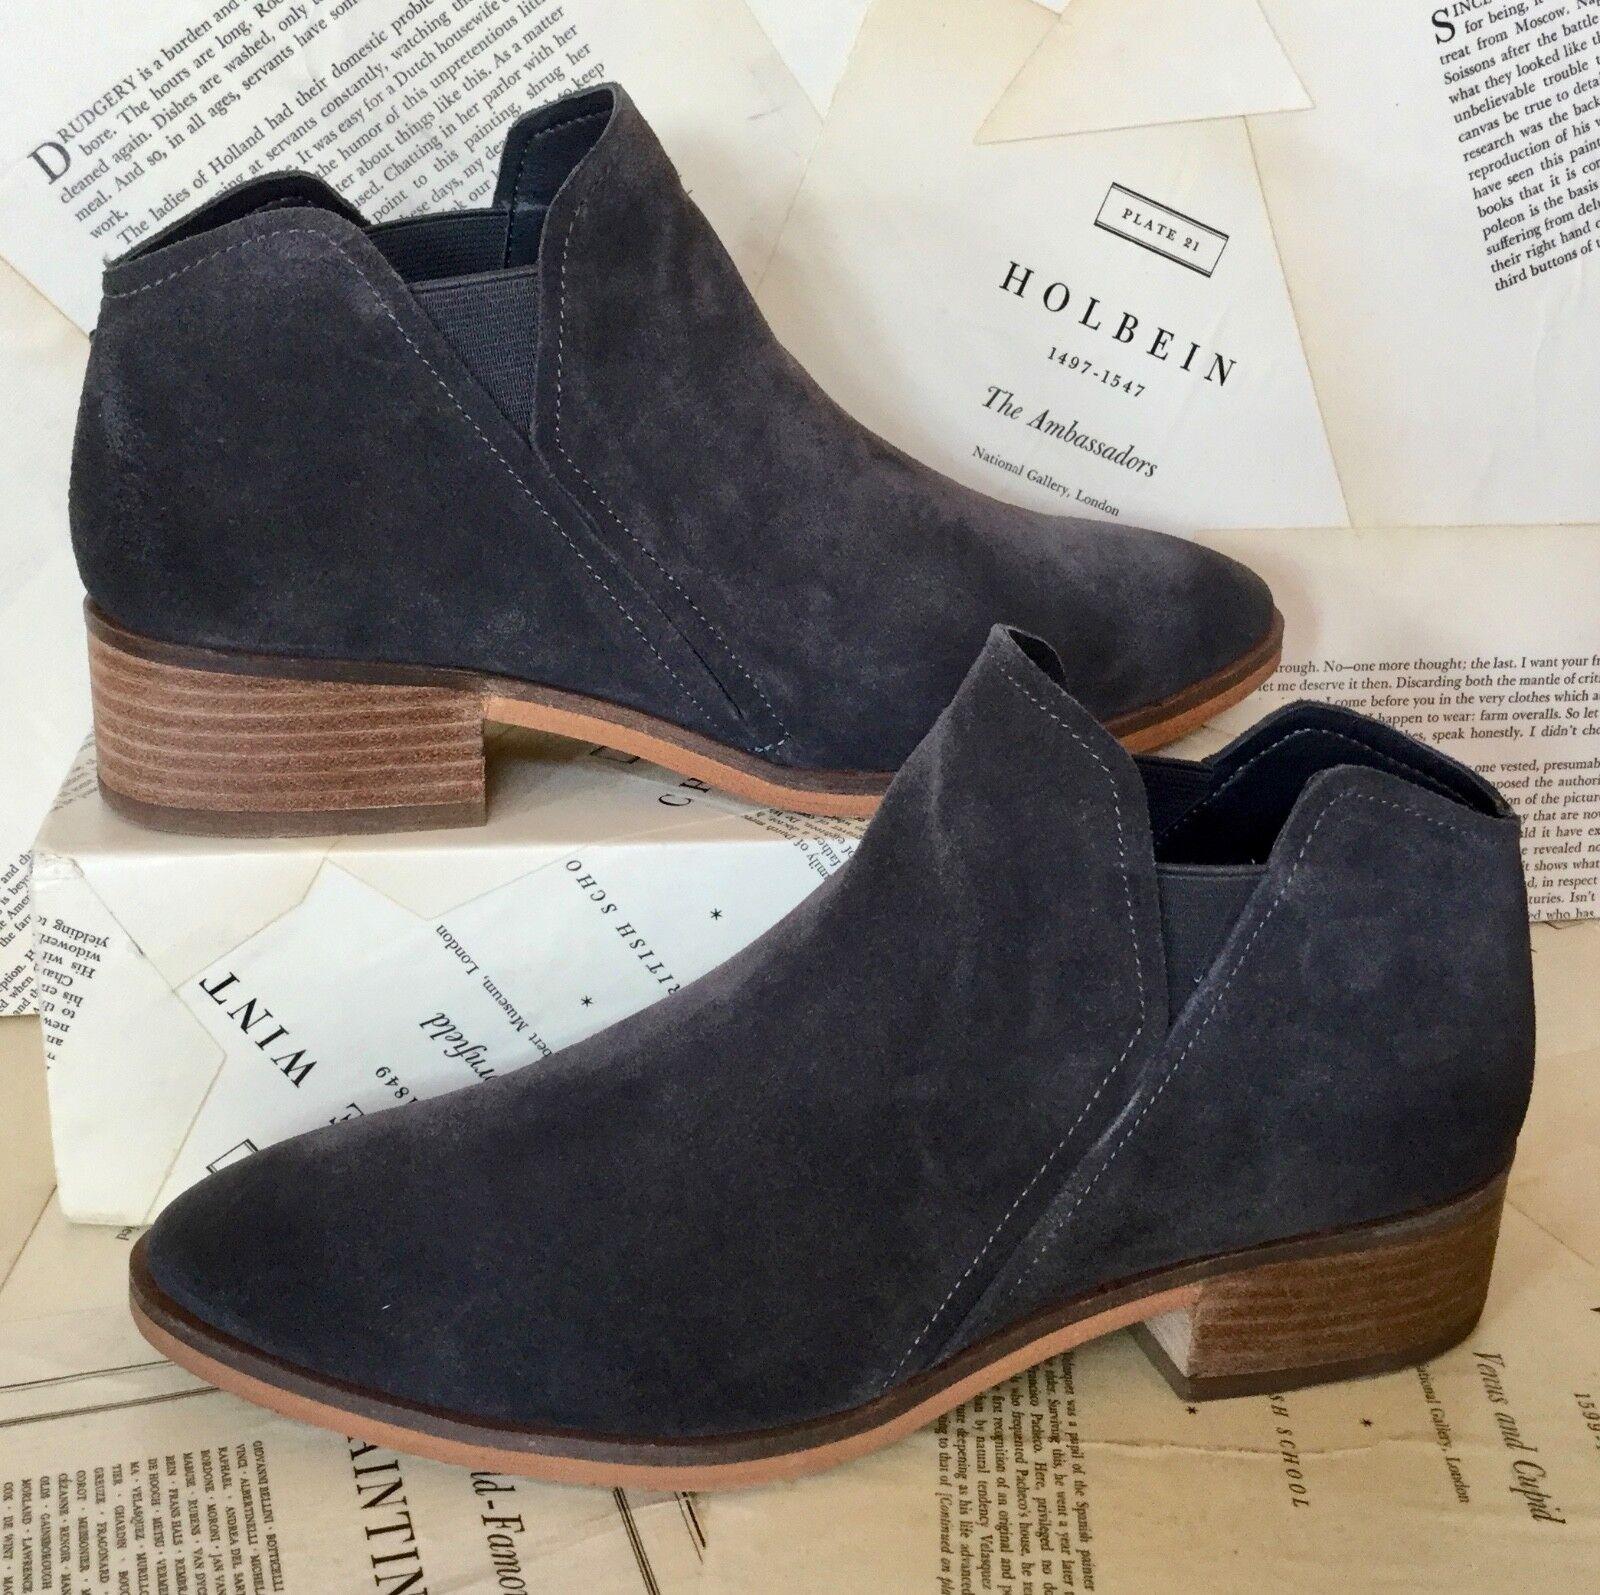 NIB Anthropologie Dolce Vita dark gray Suede On Chelsea Slip On Suede Bootie Stiefel 9.5 0e8ee4